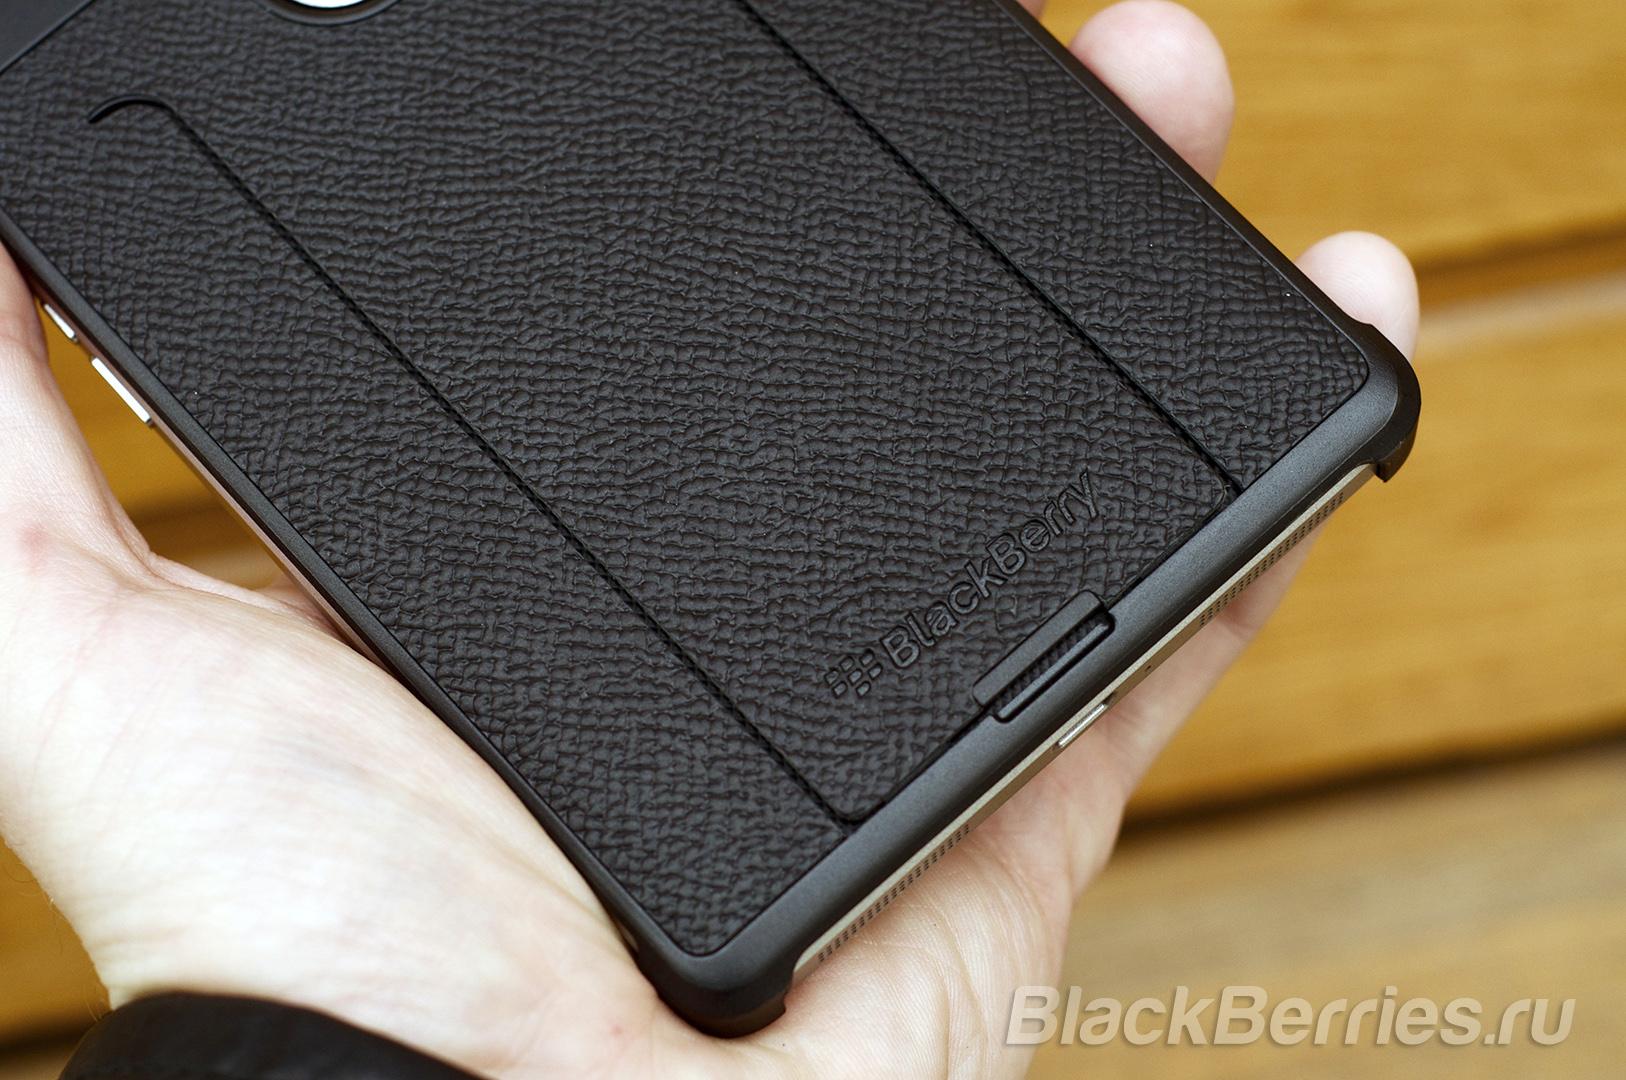 BlackBerry-Passport-Silver-Edition-Cases-02